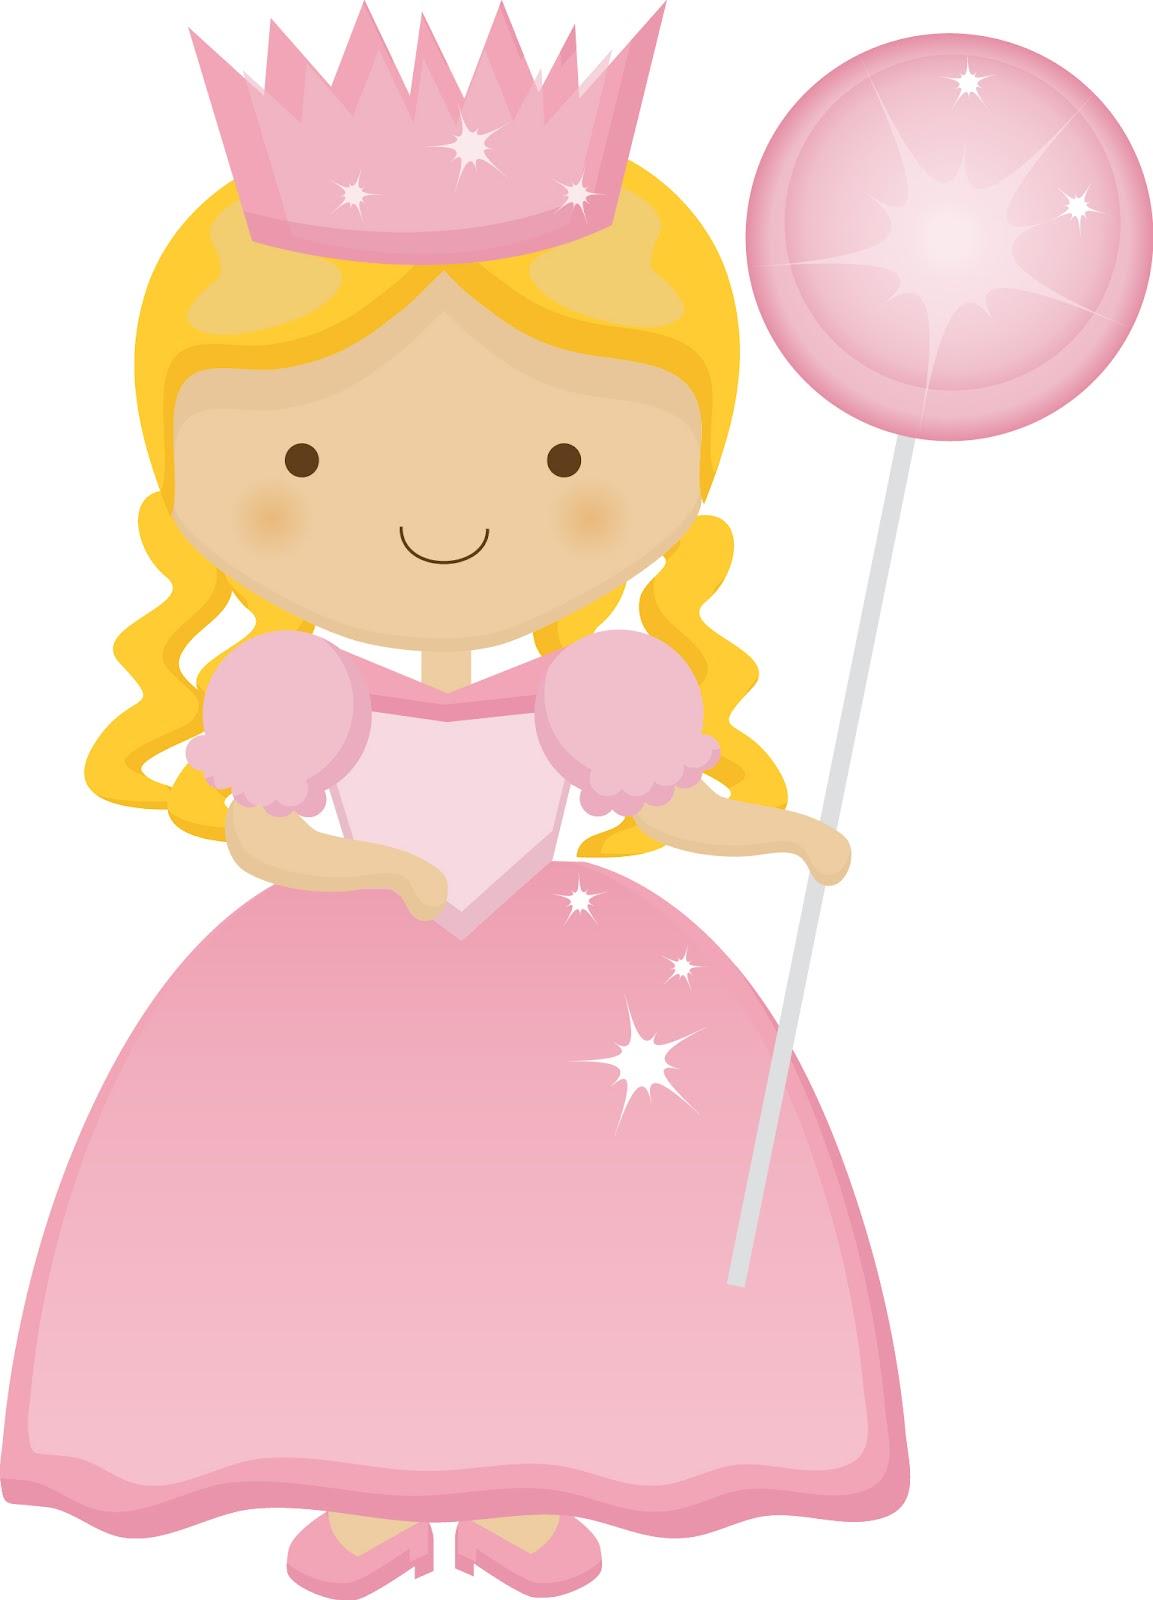 Free Glinda Cliparts, Download Free Clip Art, Free Clip Art on.